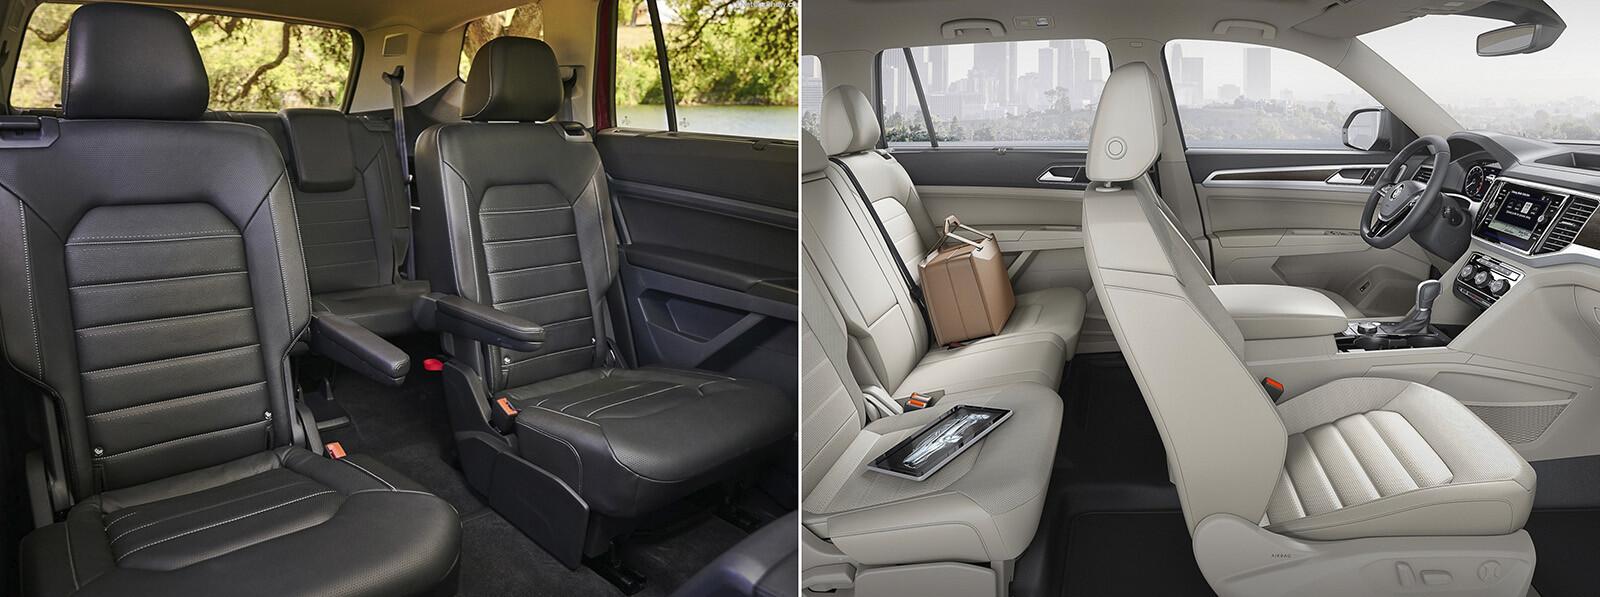 123398 dc7654dd6e50a1d4b43424bc35d1ccee - Больше, но дешевле «Туарега»: такого кроссовера Volkswagen еще не было